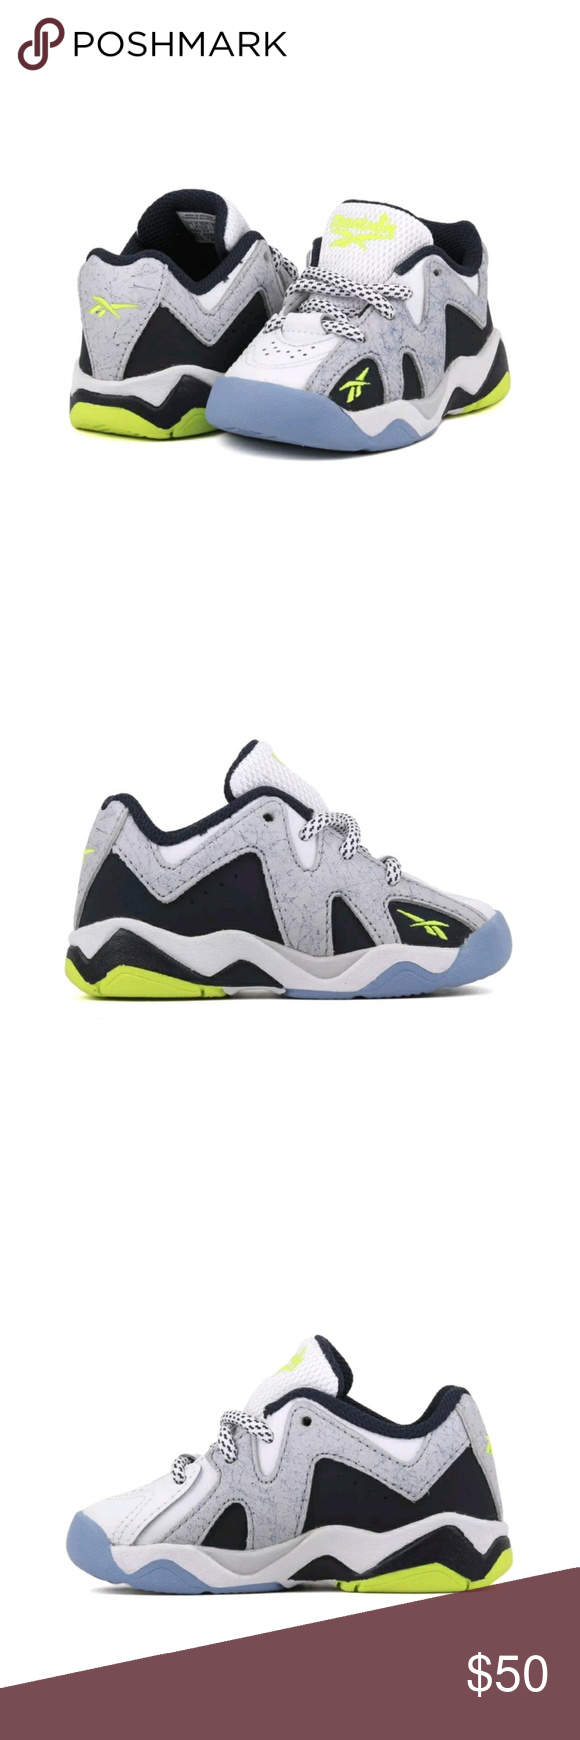 Reebok Kamikaze Sneakers infant shoe size 4 Authentic Reebok Super fast worldwide shipping  READY TO SHIP WITH BOX INFANT SHOE SIZE 4 Gray, green, blue  #sneakers #shoes #goodmorning  #kicks  #reebok  #shoe #infant #kids #fashion #babyshoes Reebok Shoes